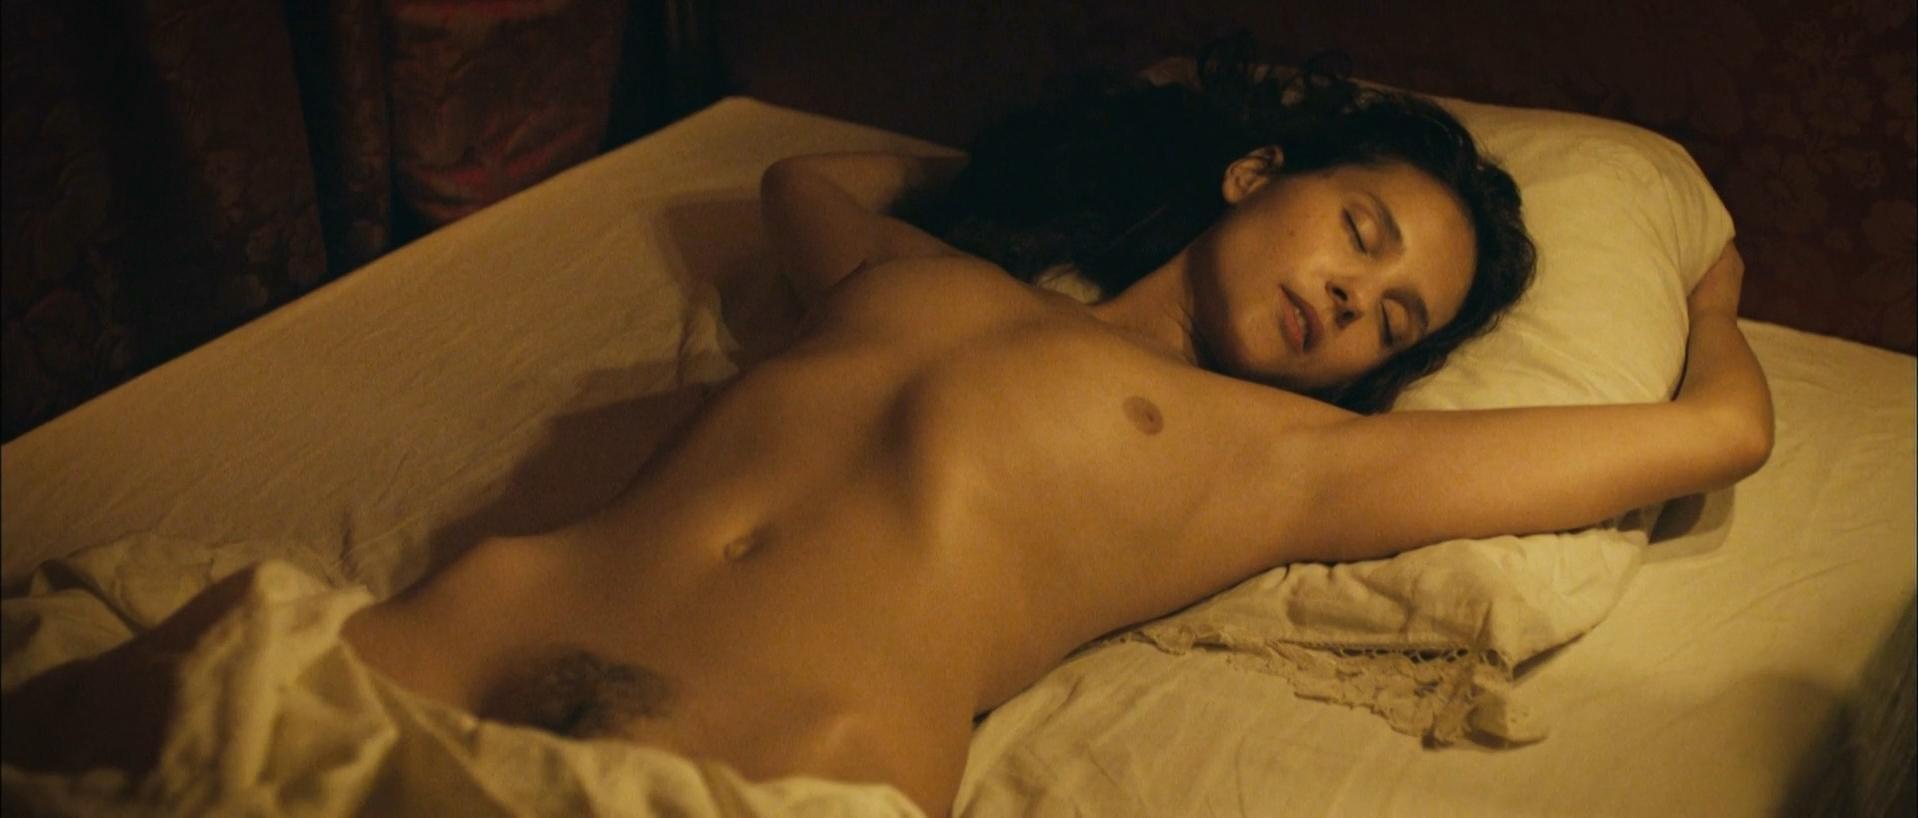 Virginie Ledoyen nude, Lea Seydoux nude - Farewell, My Queen (2012)